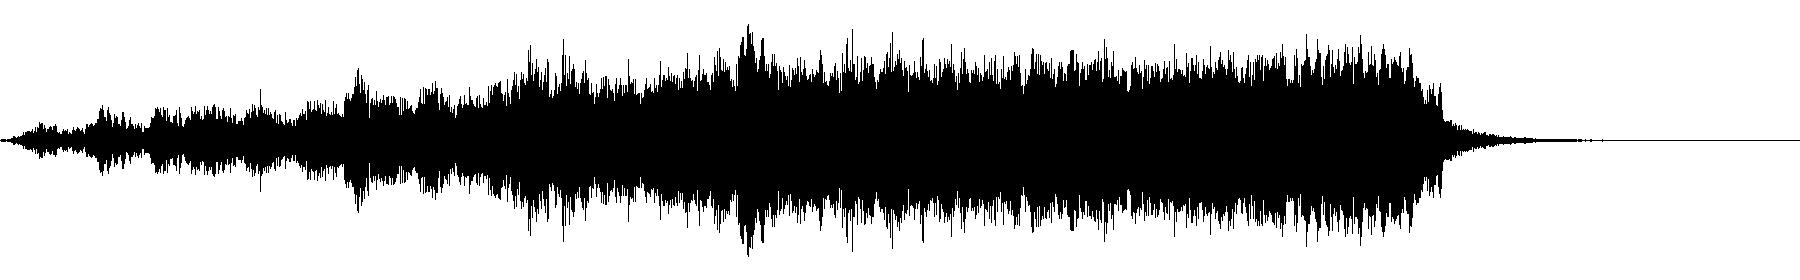 str fx b 05 xc